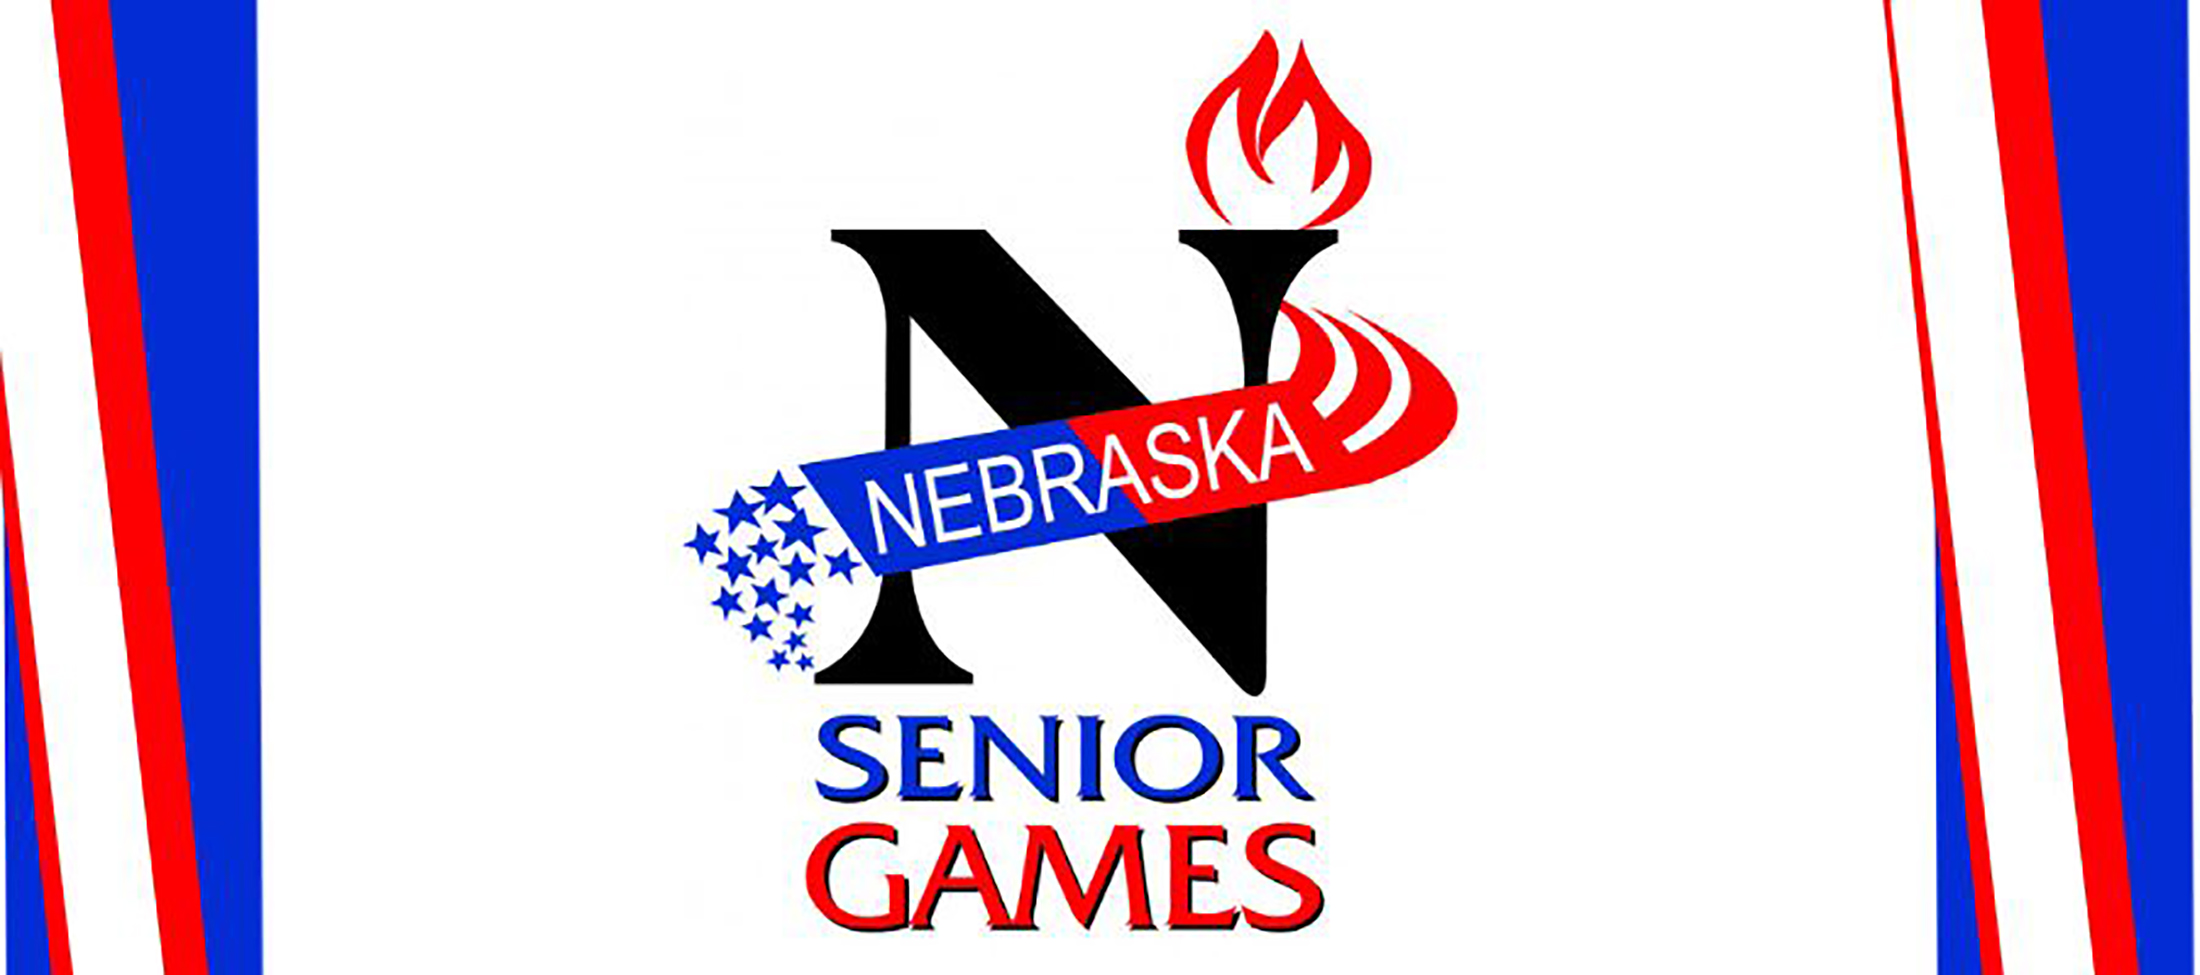 Official logo of the Nebraska Senior Games held in Kearney, Nebraska